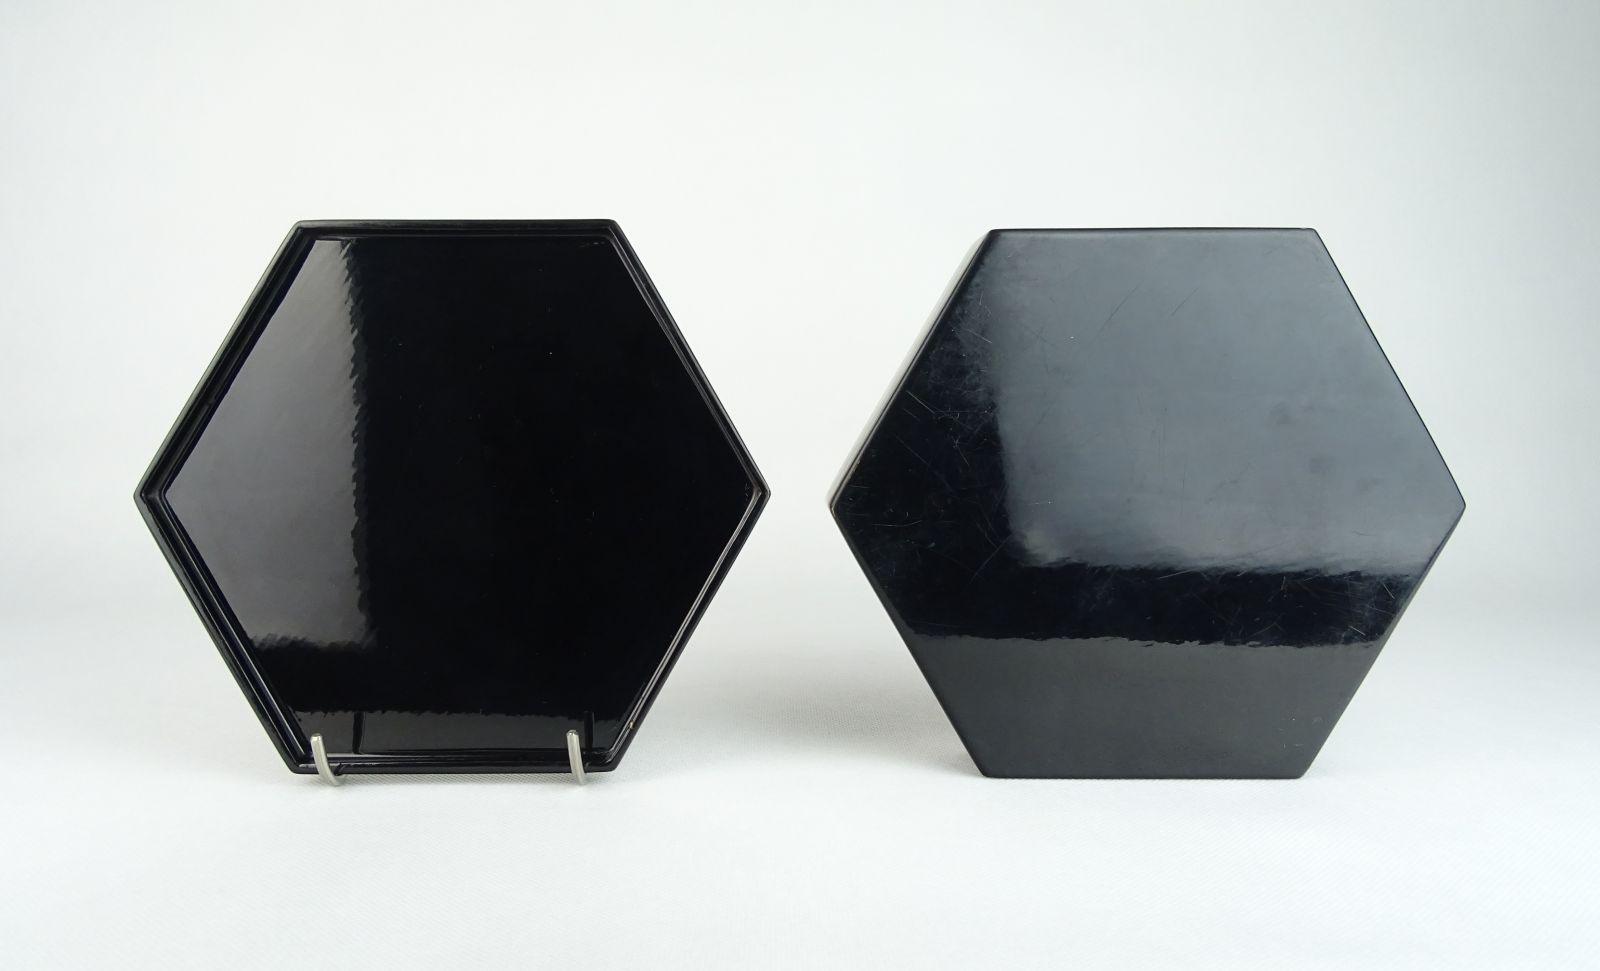 DSC02086.JPG (1600×971)